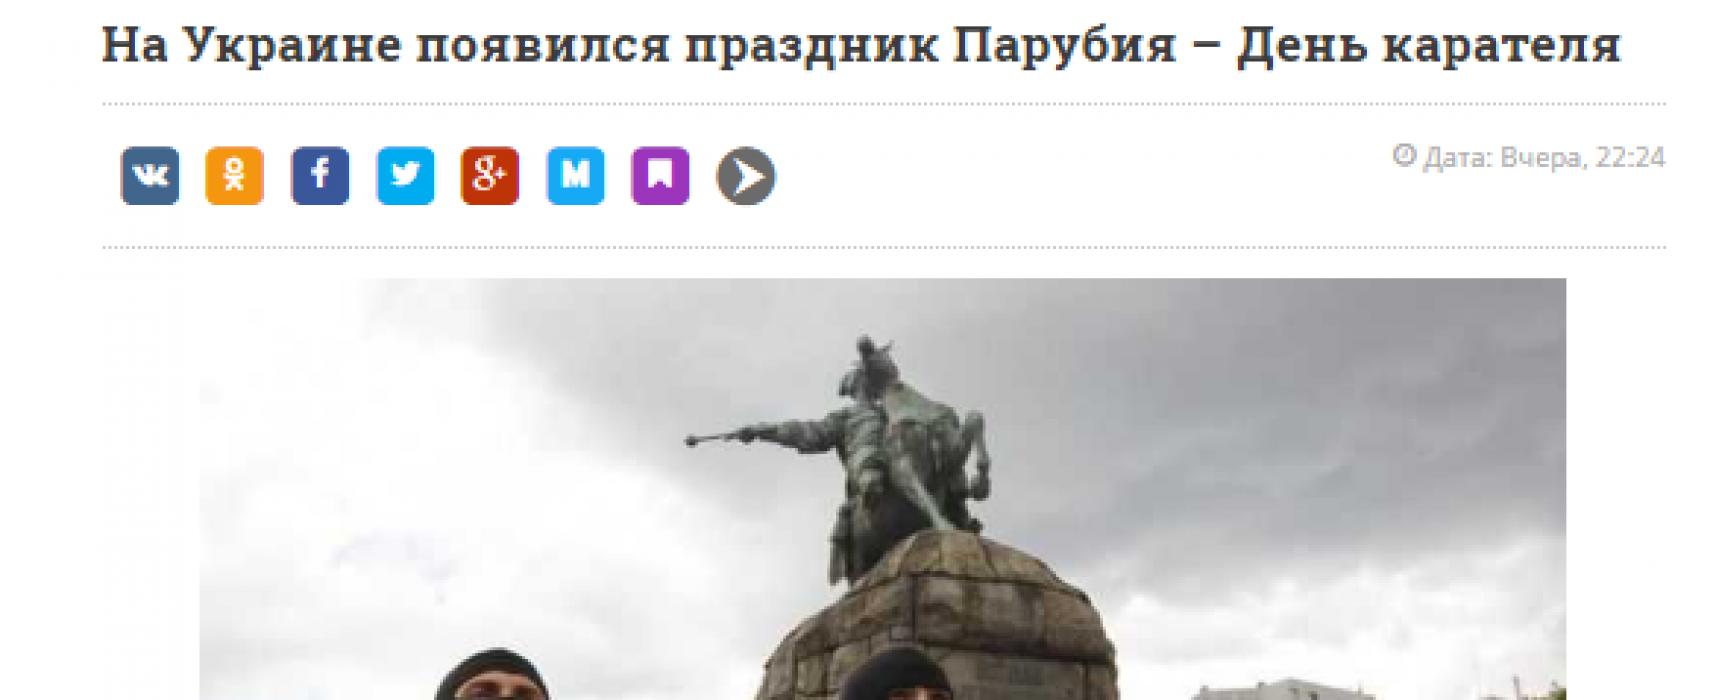 Fake: Ukraine's New Holiday – Day of the Avenger